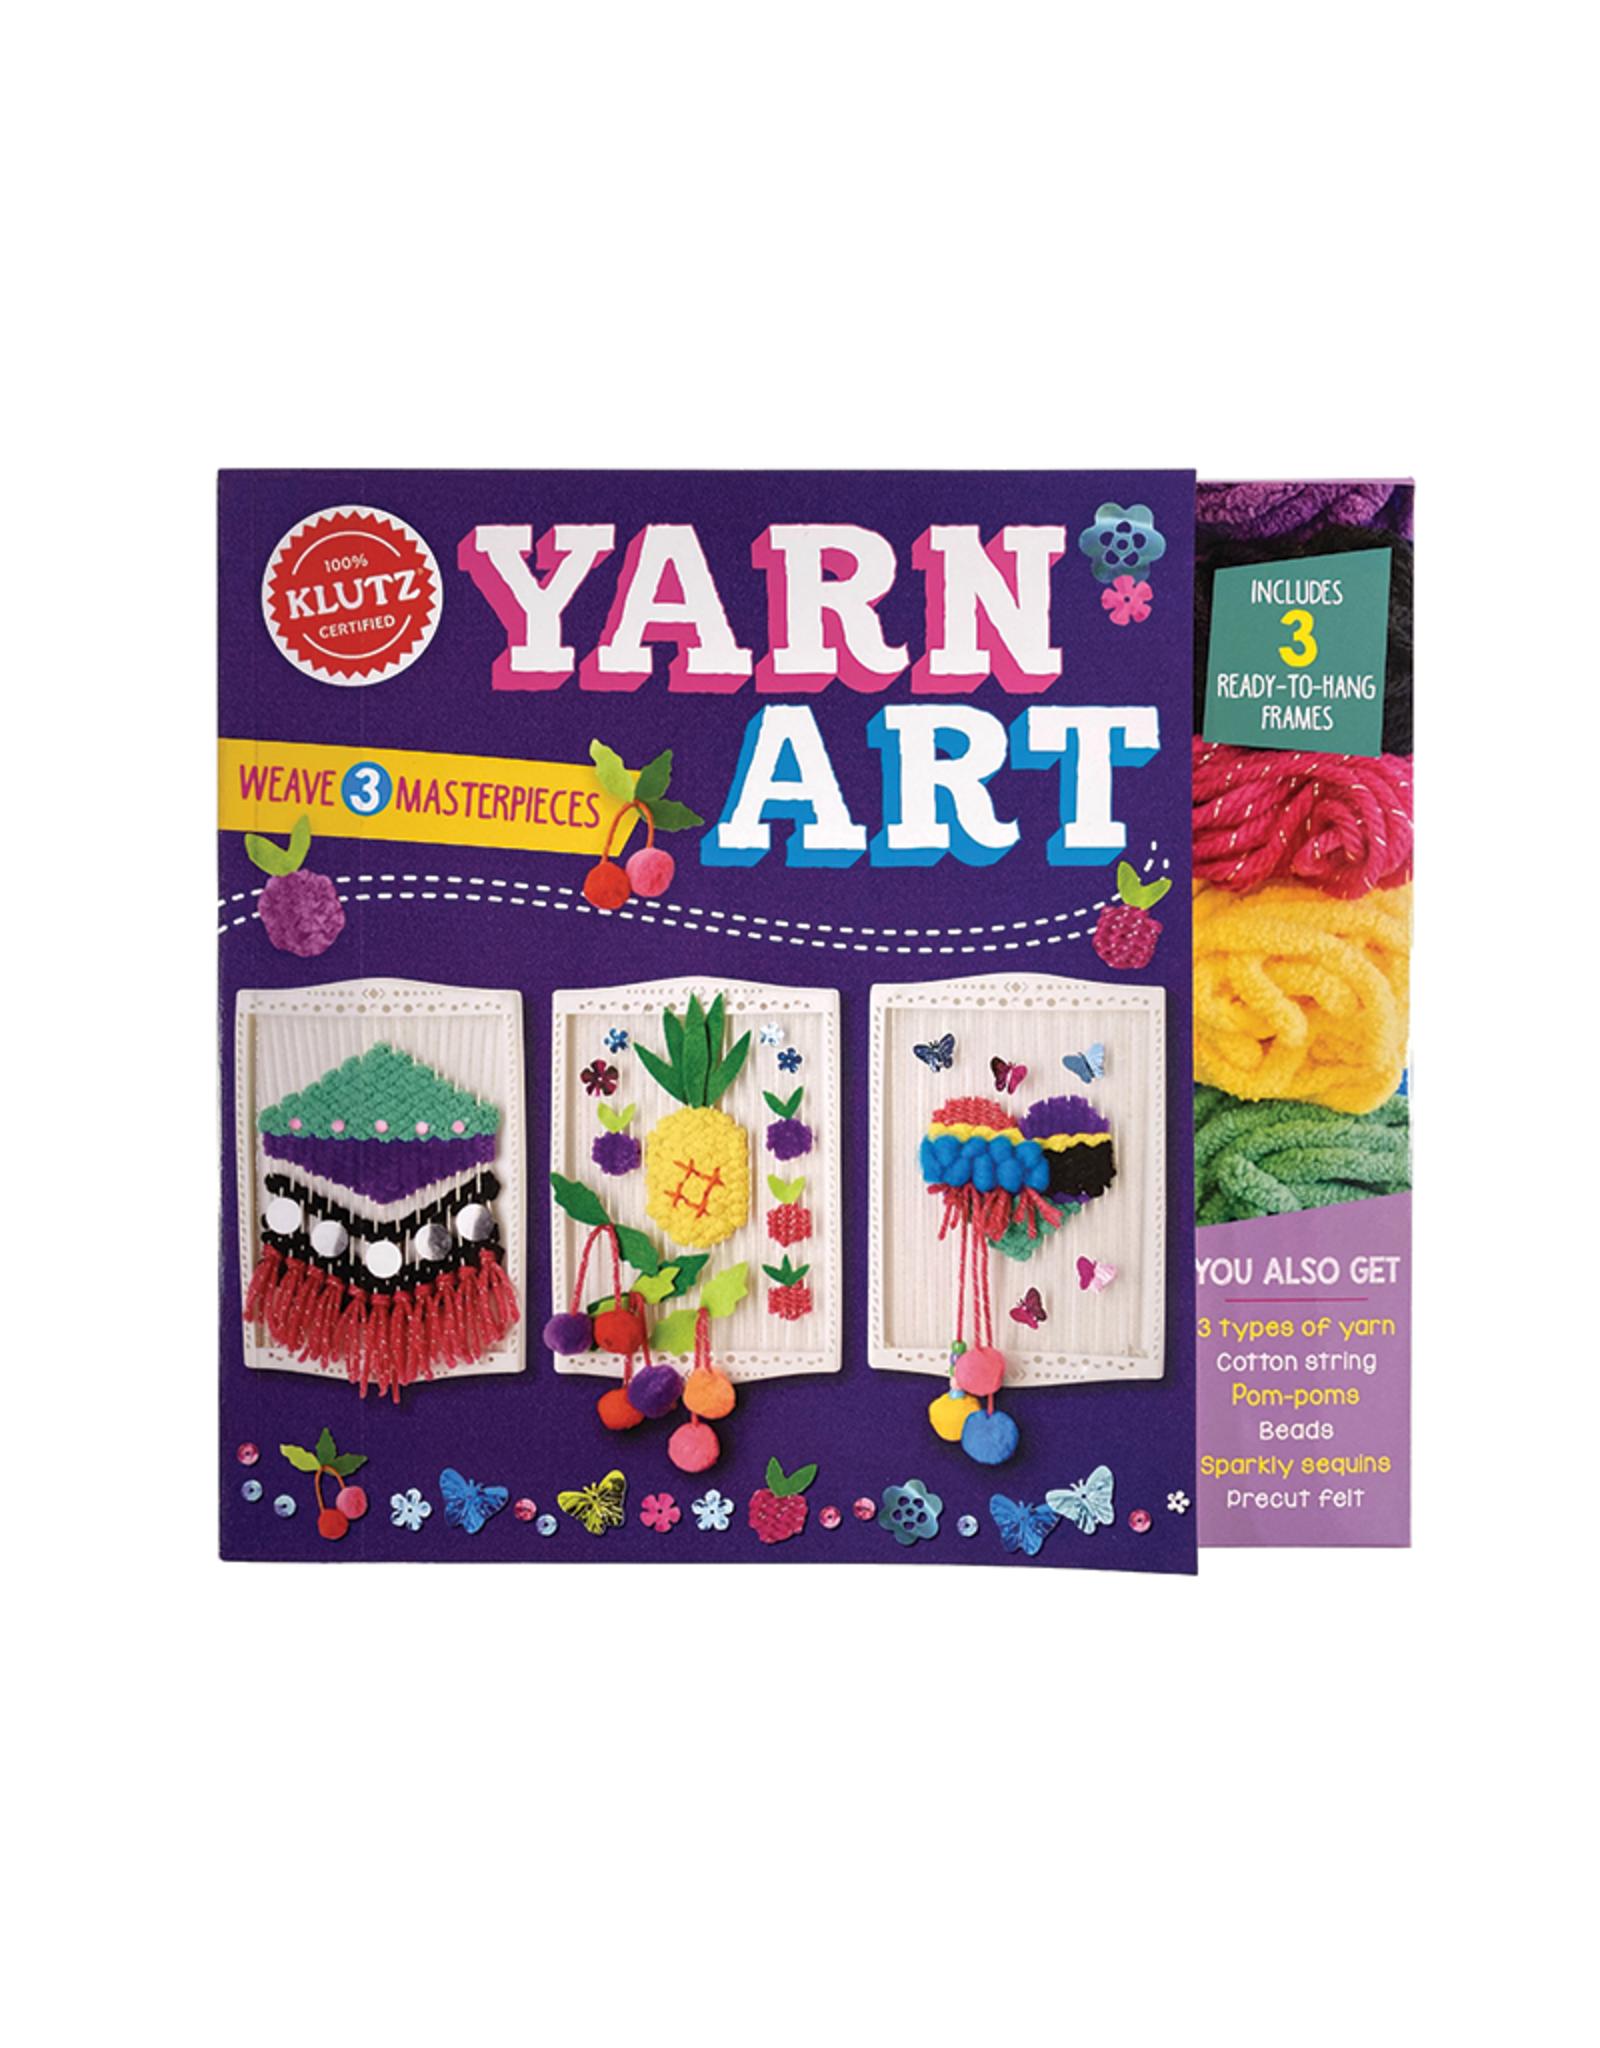 Yarn Art Craft Kit